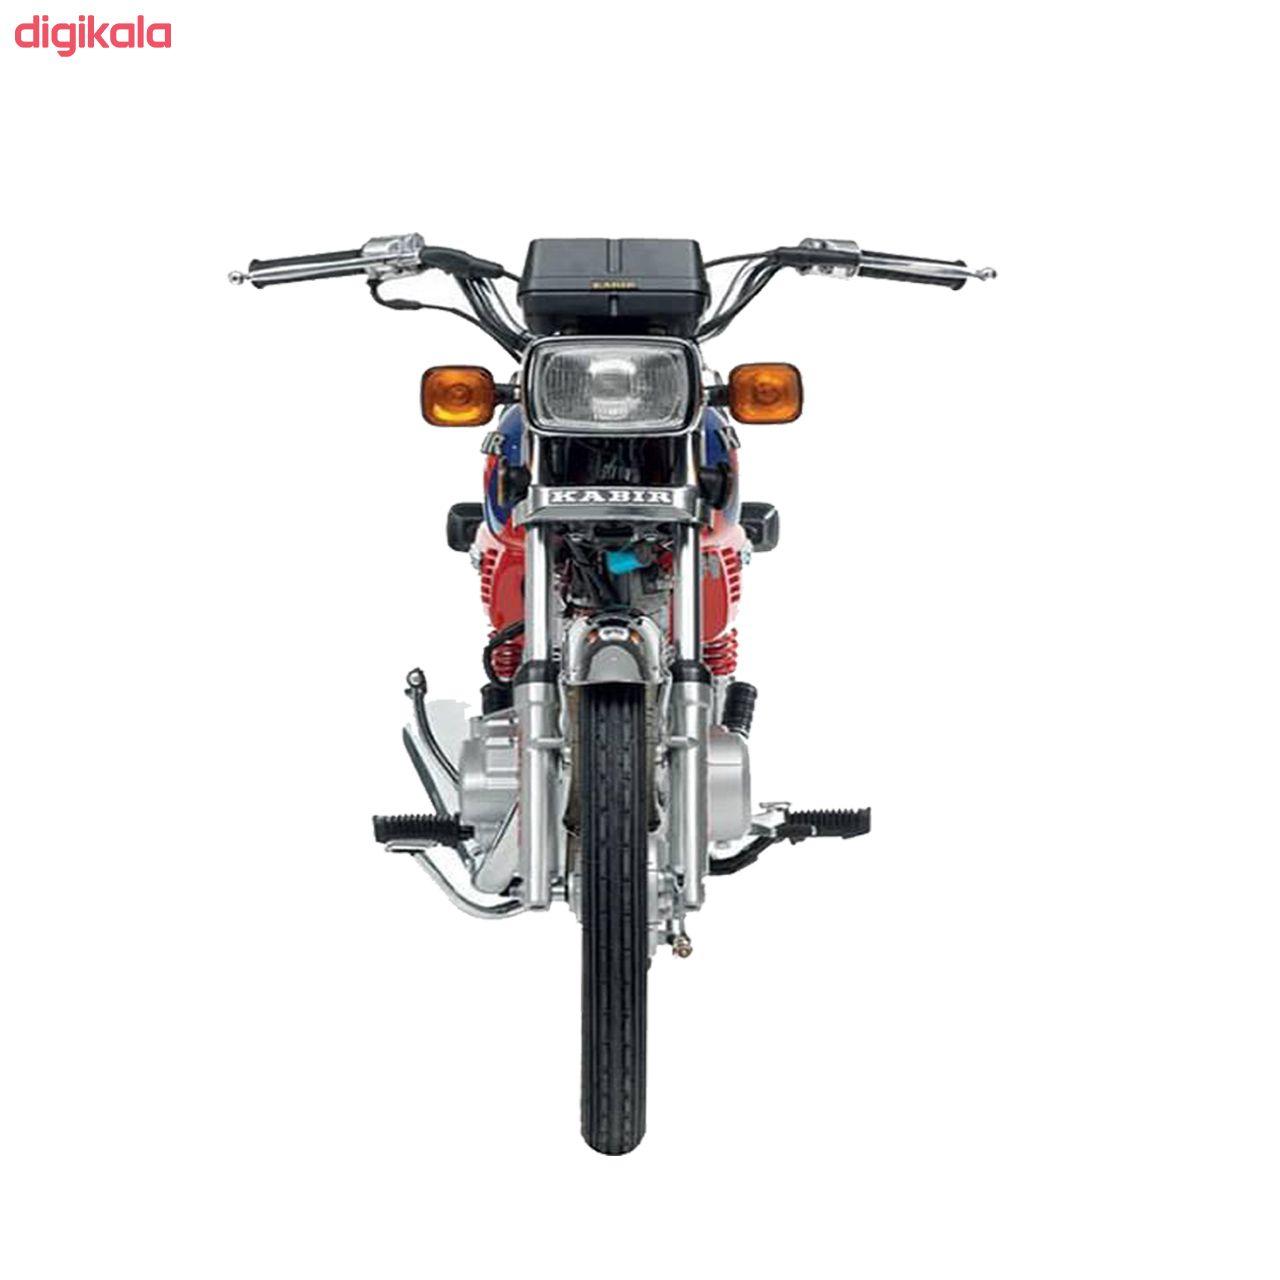 موتورسیکلت کویر مدل سی دی آی 125 سی سی سال 1399 main 1 2